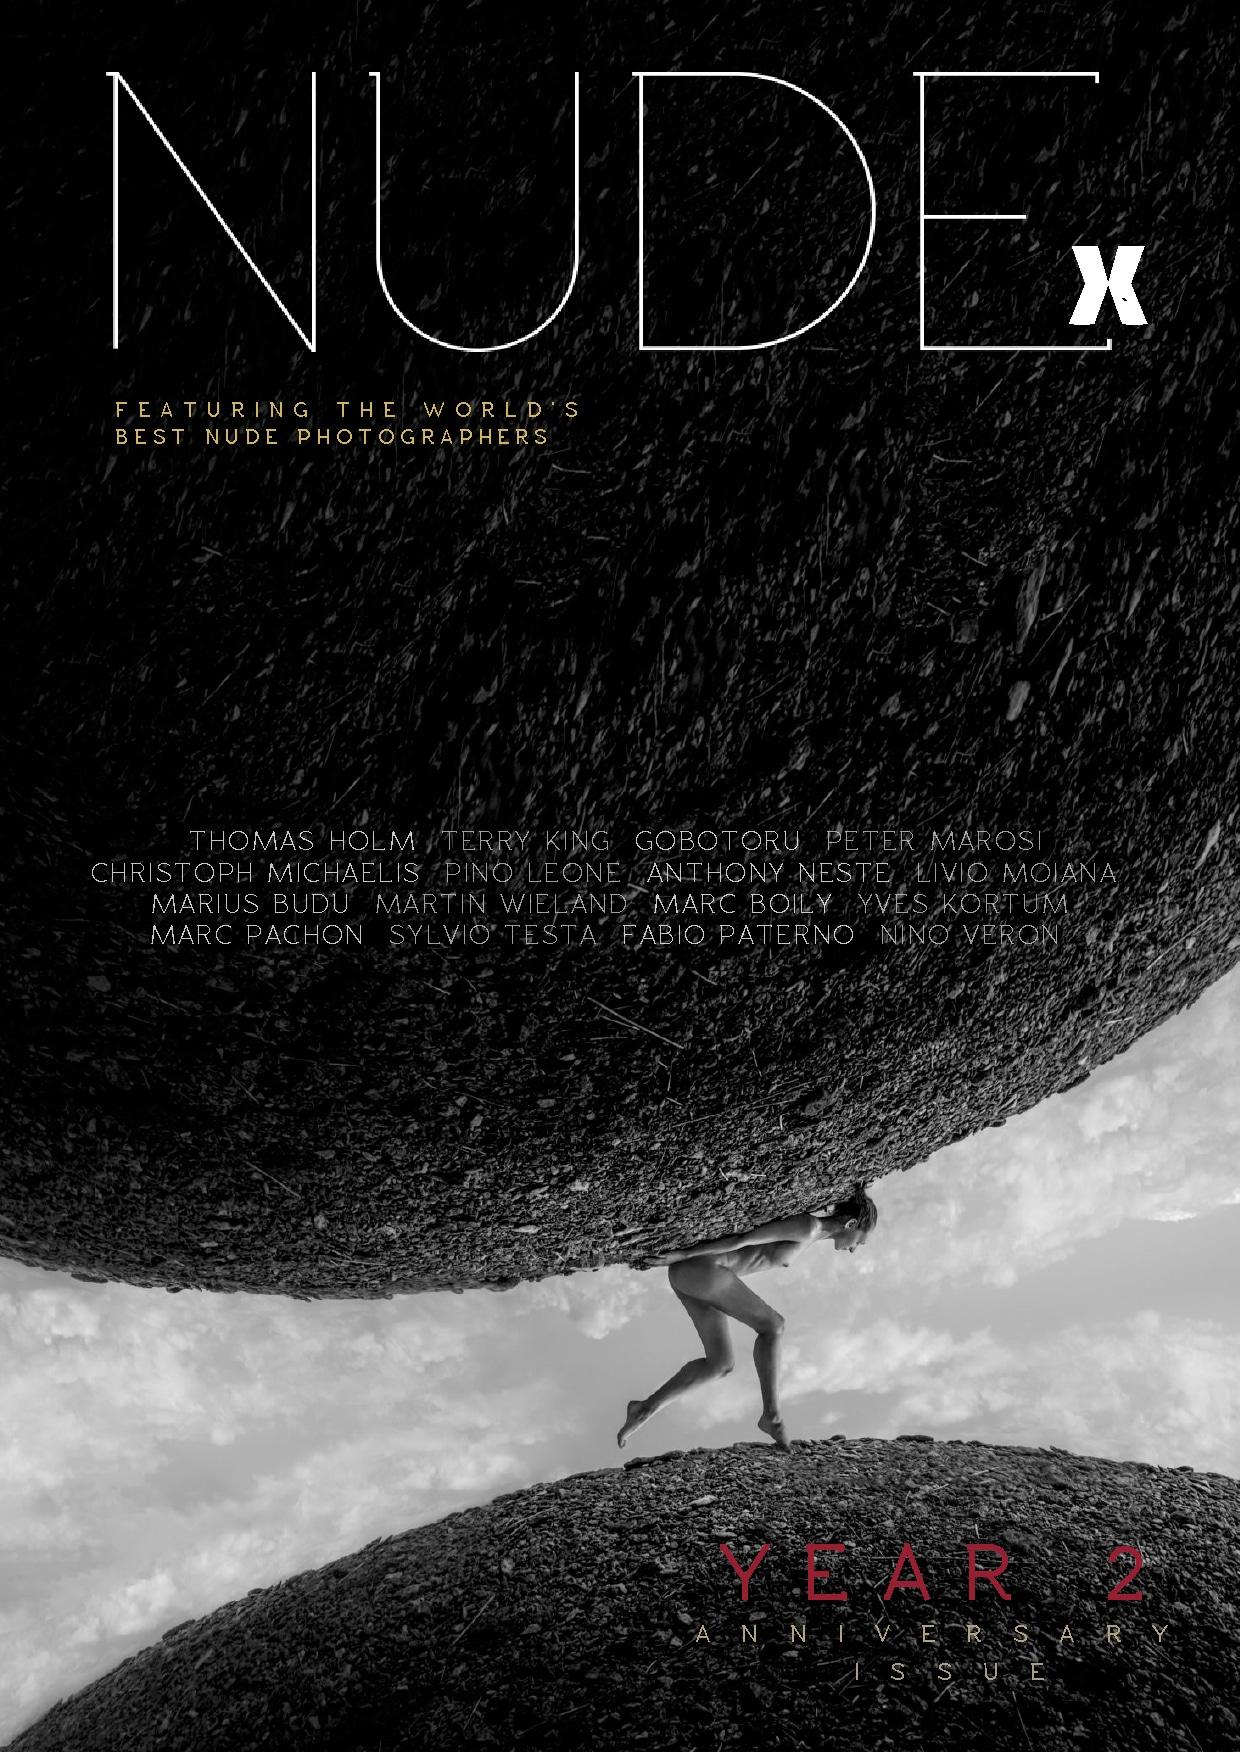 Nude Magazine - Numero 10 - Year 2 Anniversary Issue